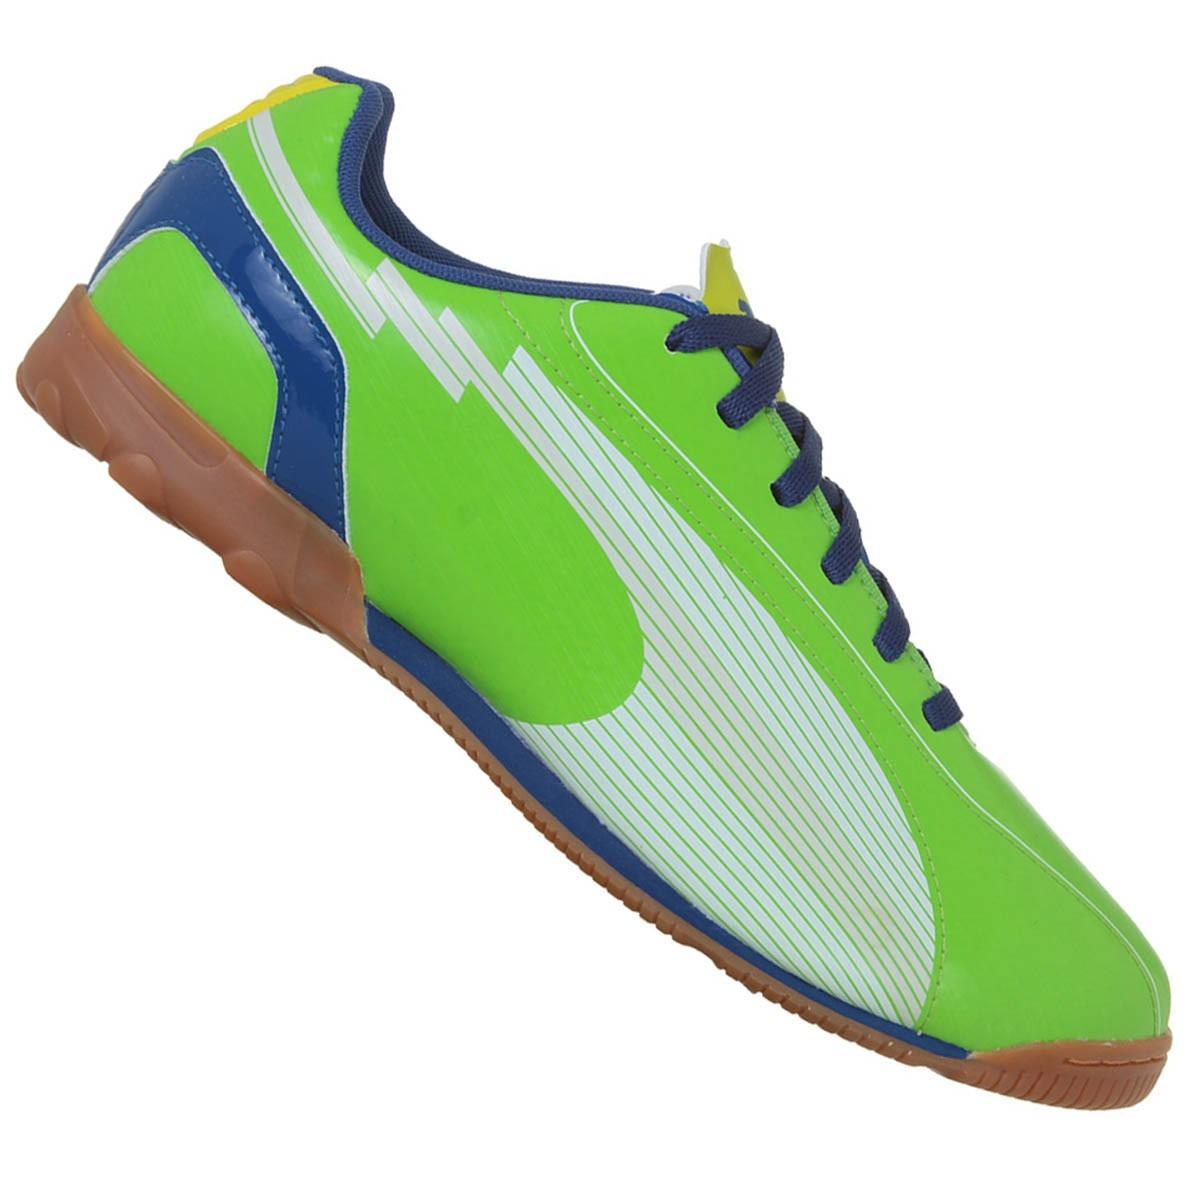 14dd9451ab Chuteira Tênis De Futsal Puma Evospeed 5 Ic Original +nf - R  120